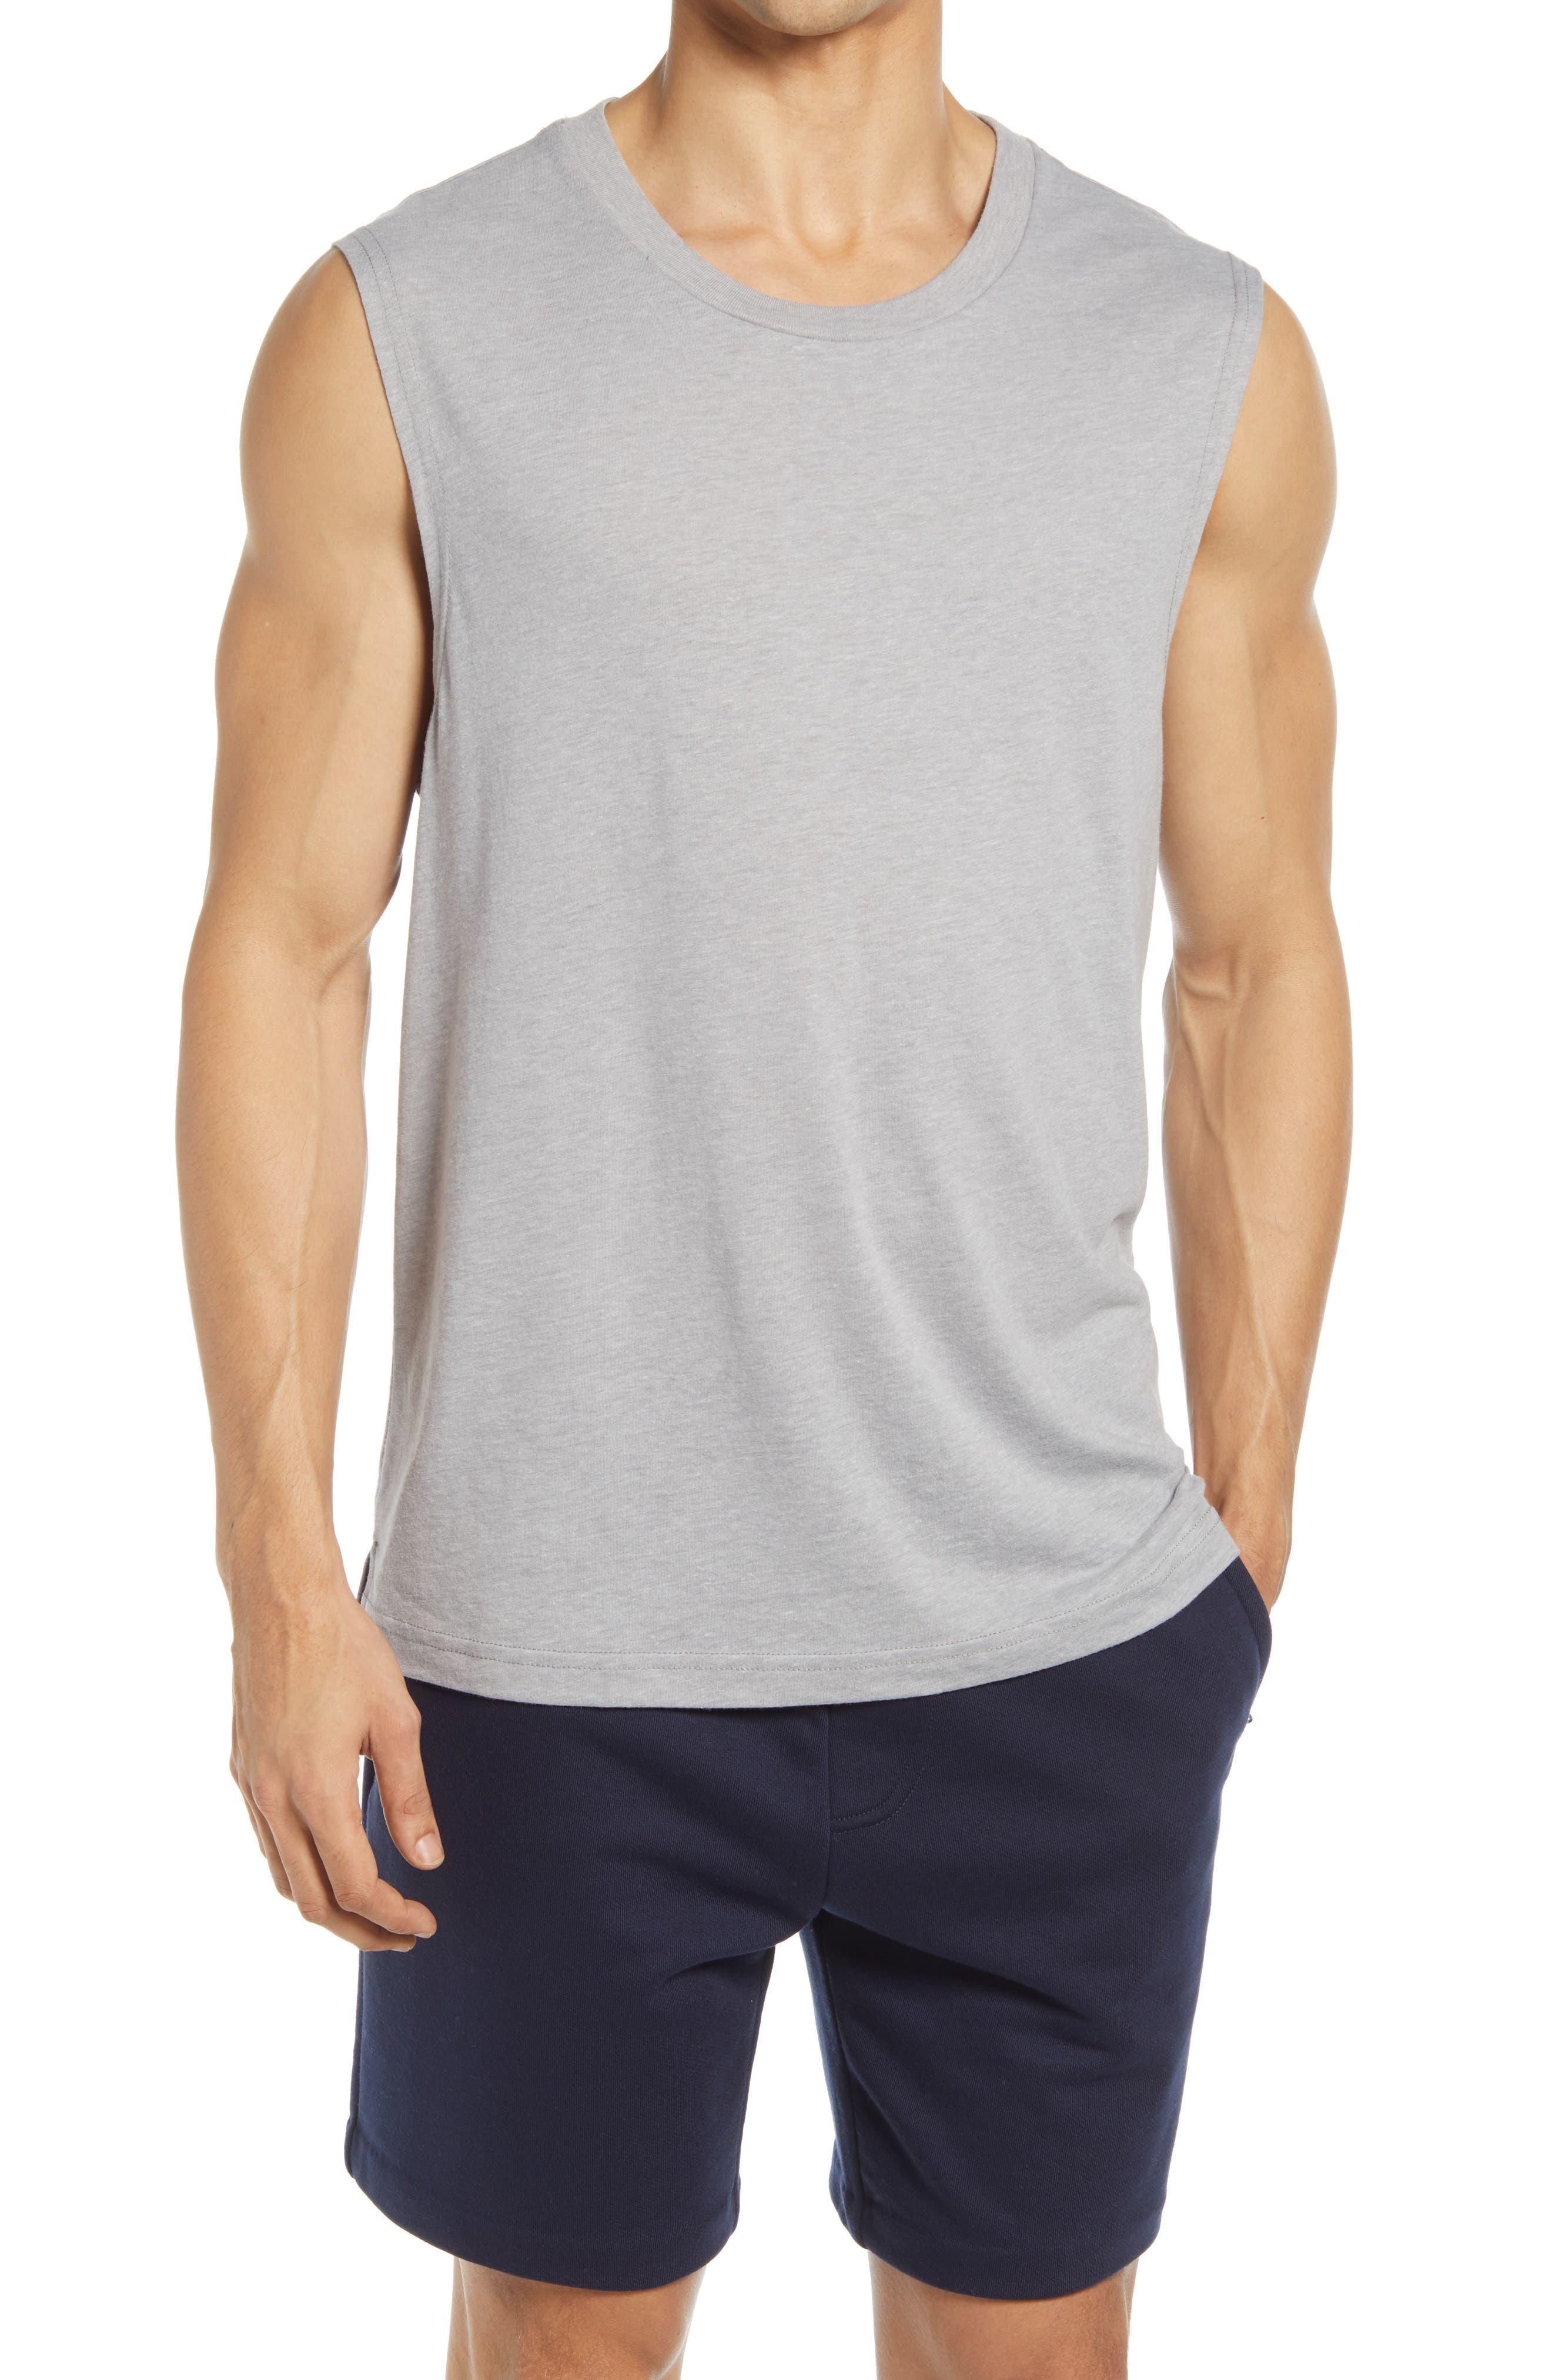 The Triumph Sleeveless T-Shirt